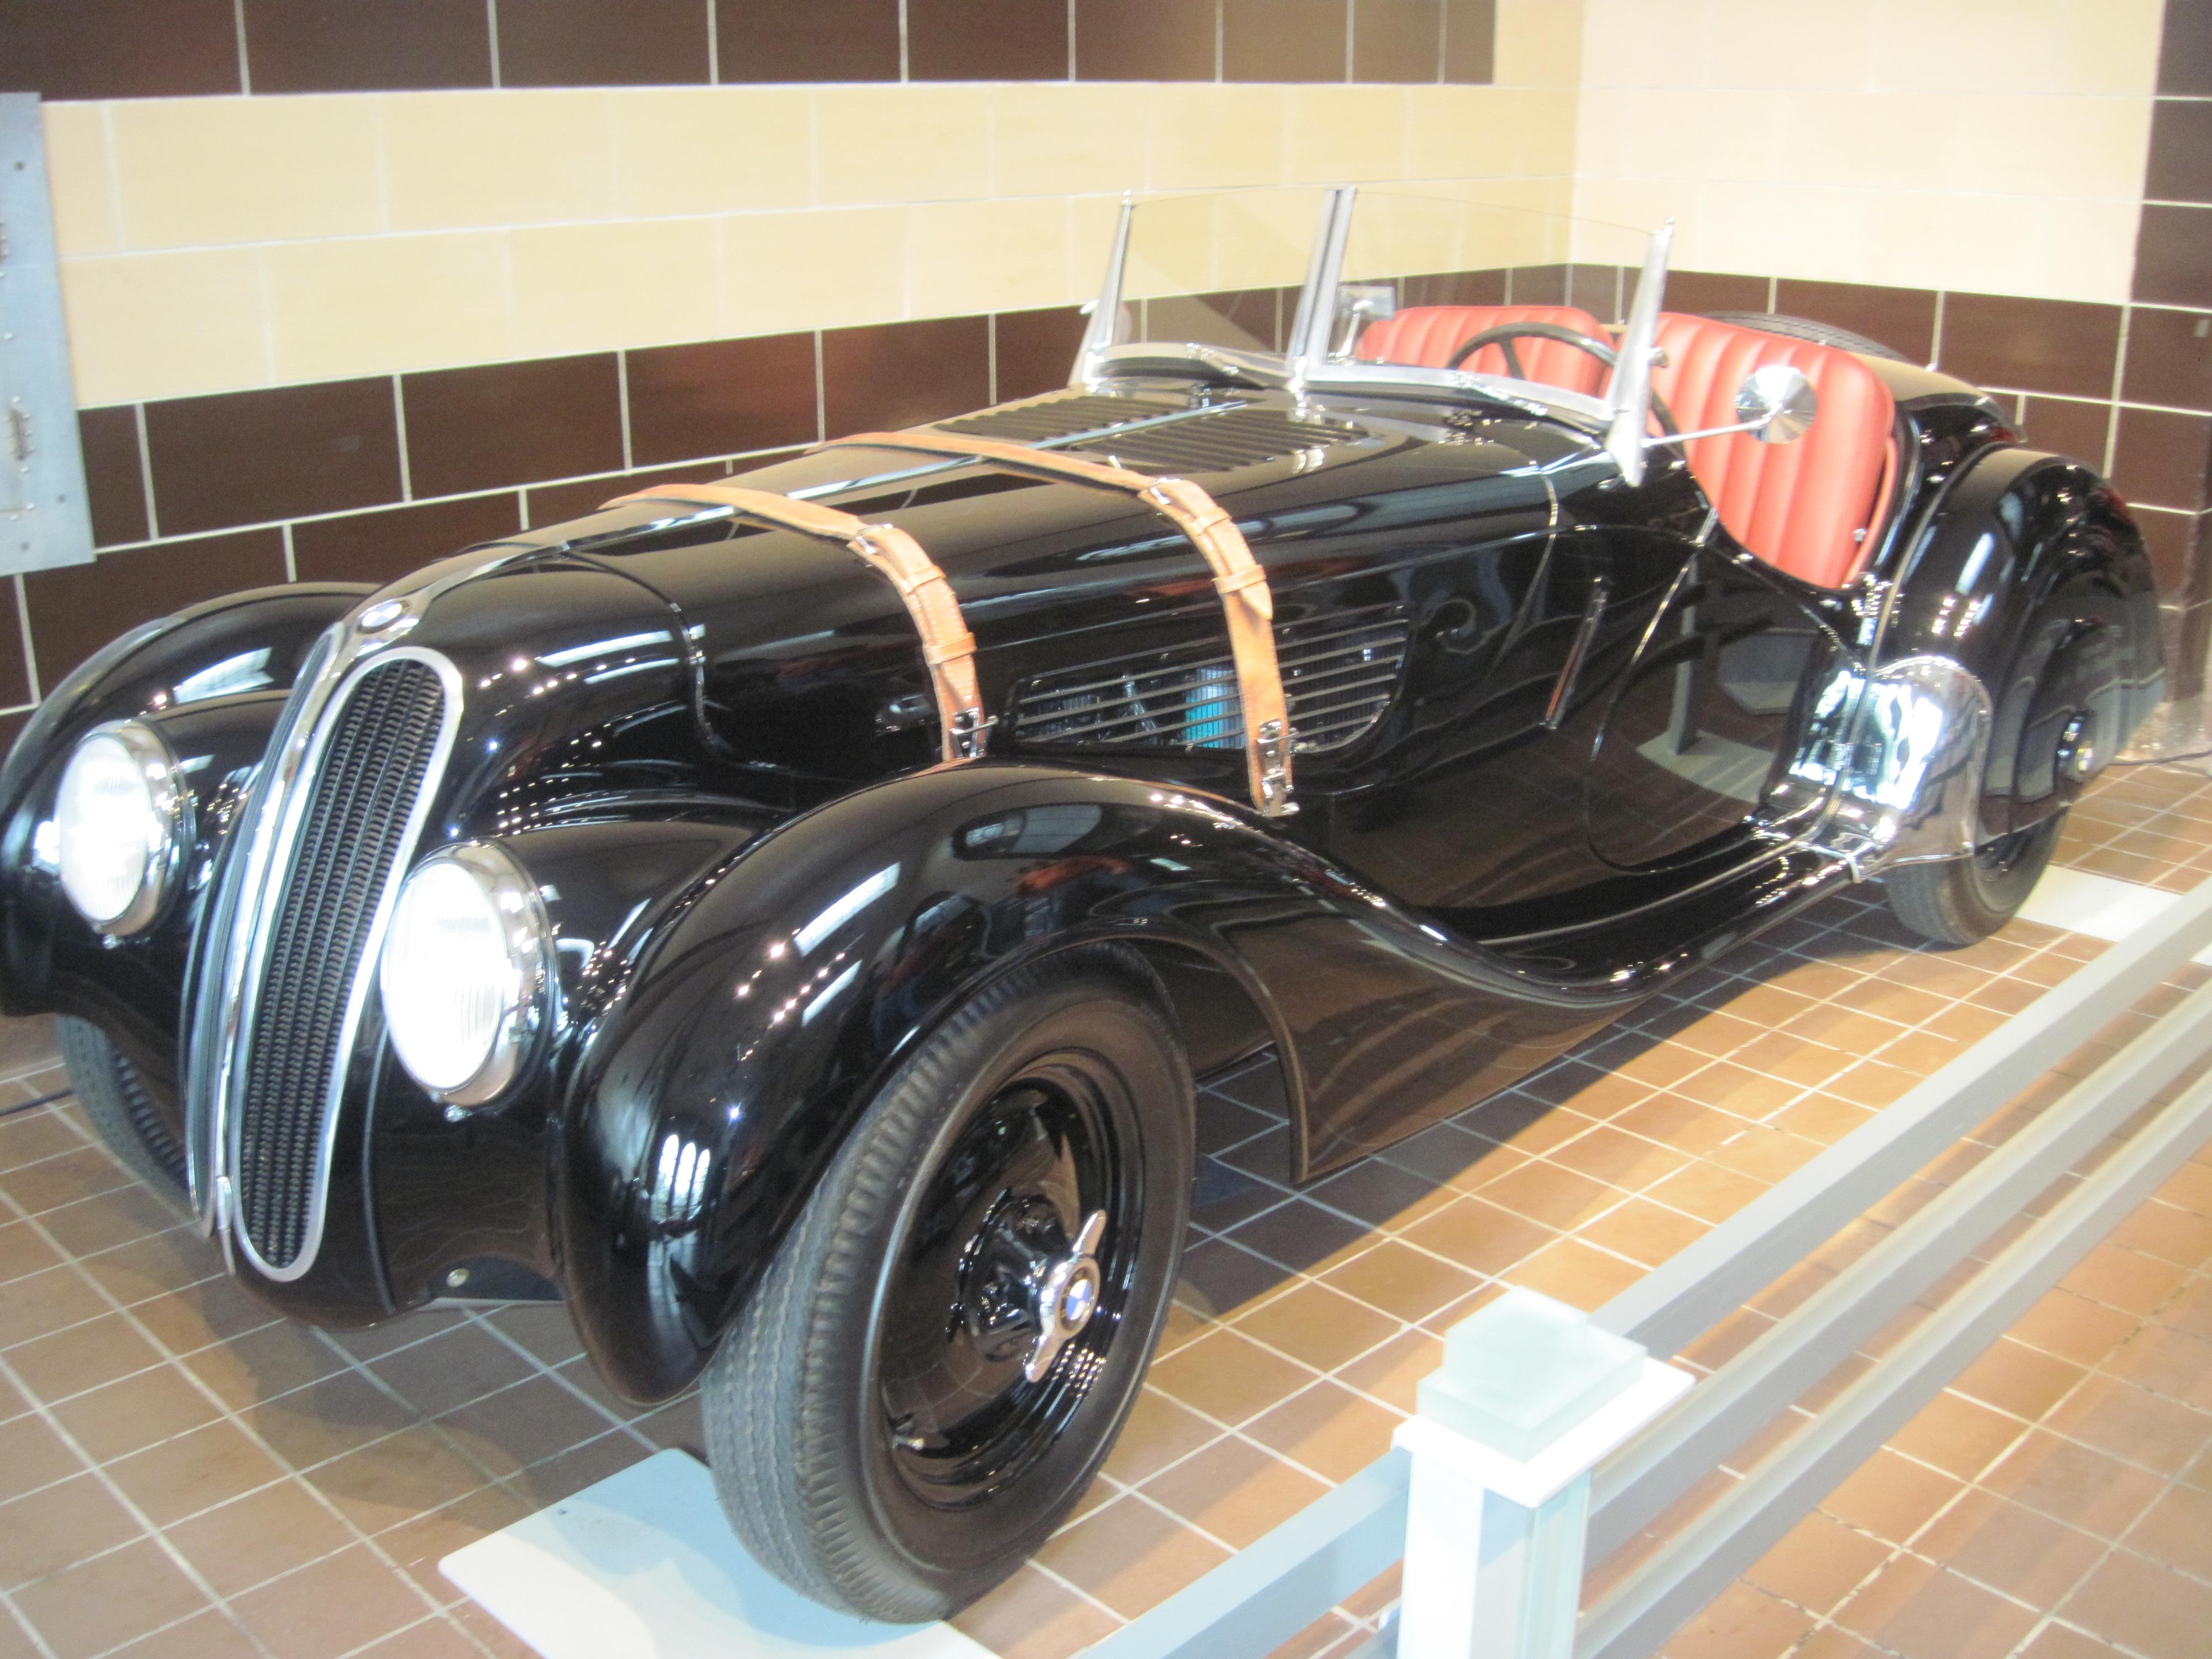 Saratoga Auto Museum Apex Automotive Magazine - Saratoga auto museum car show